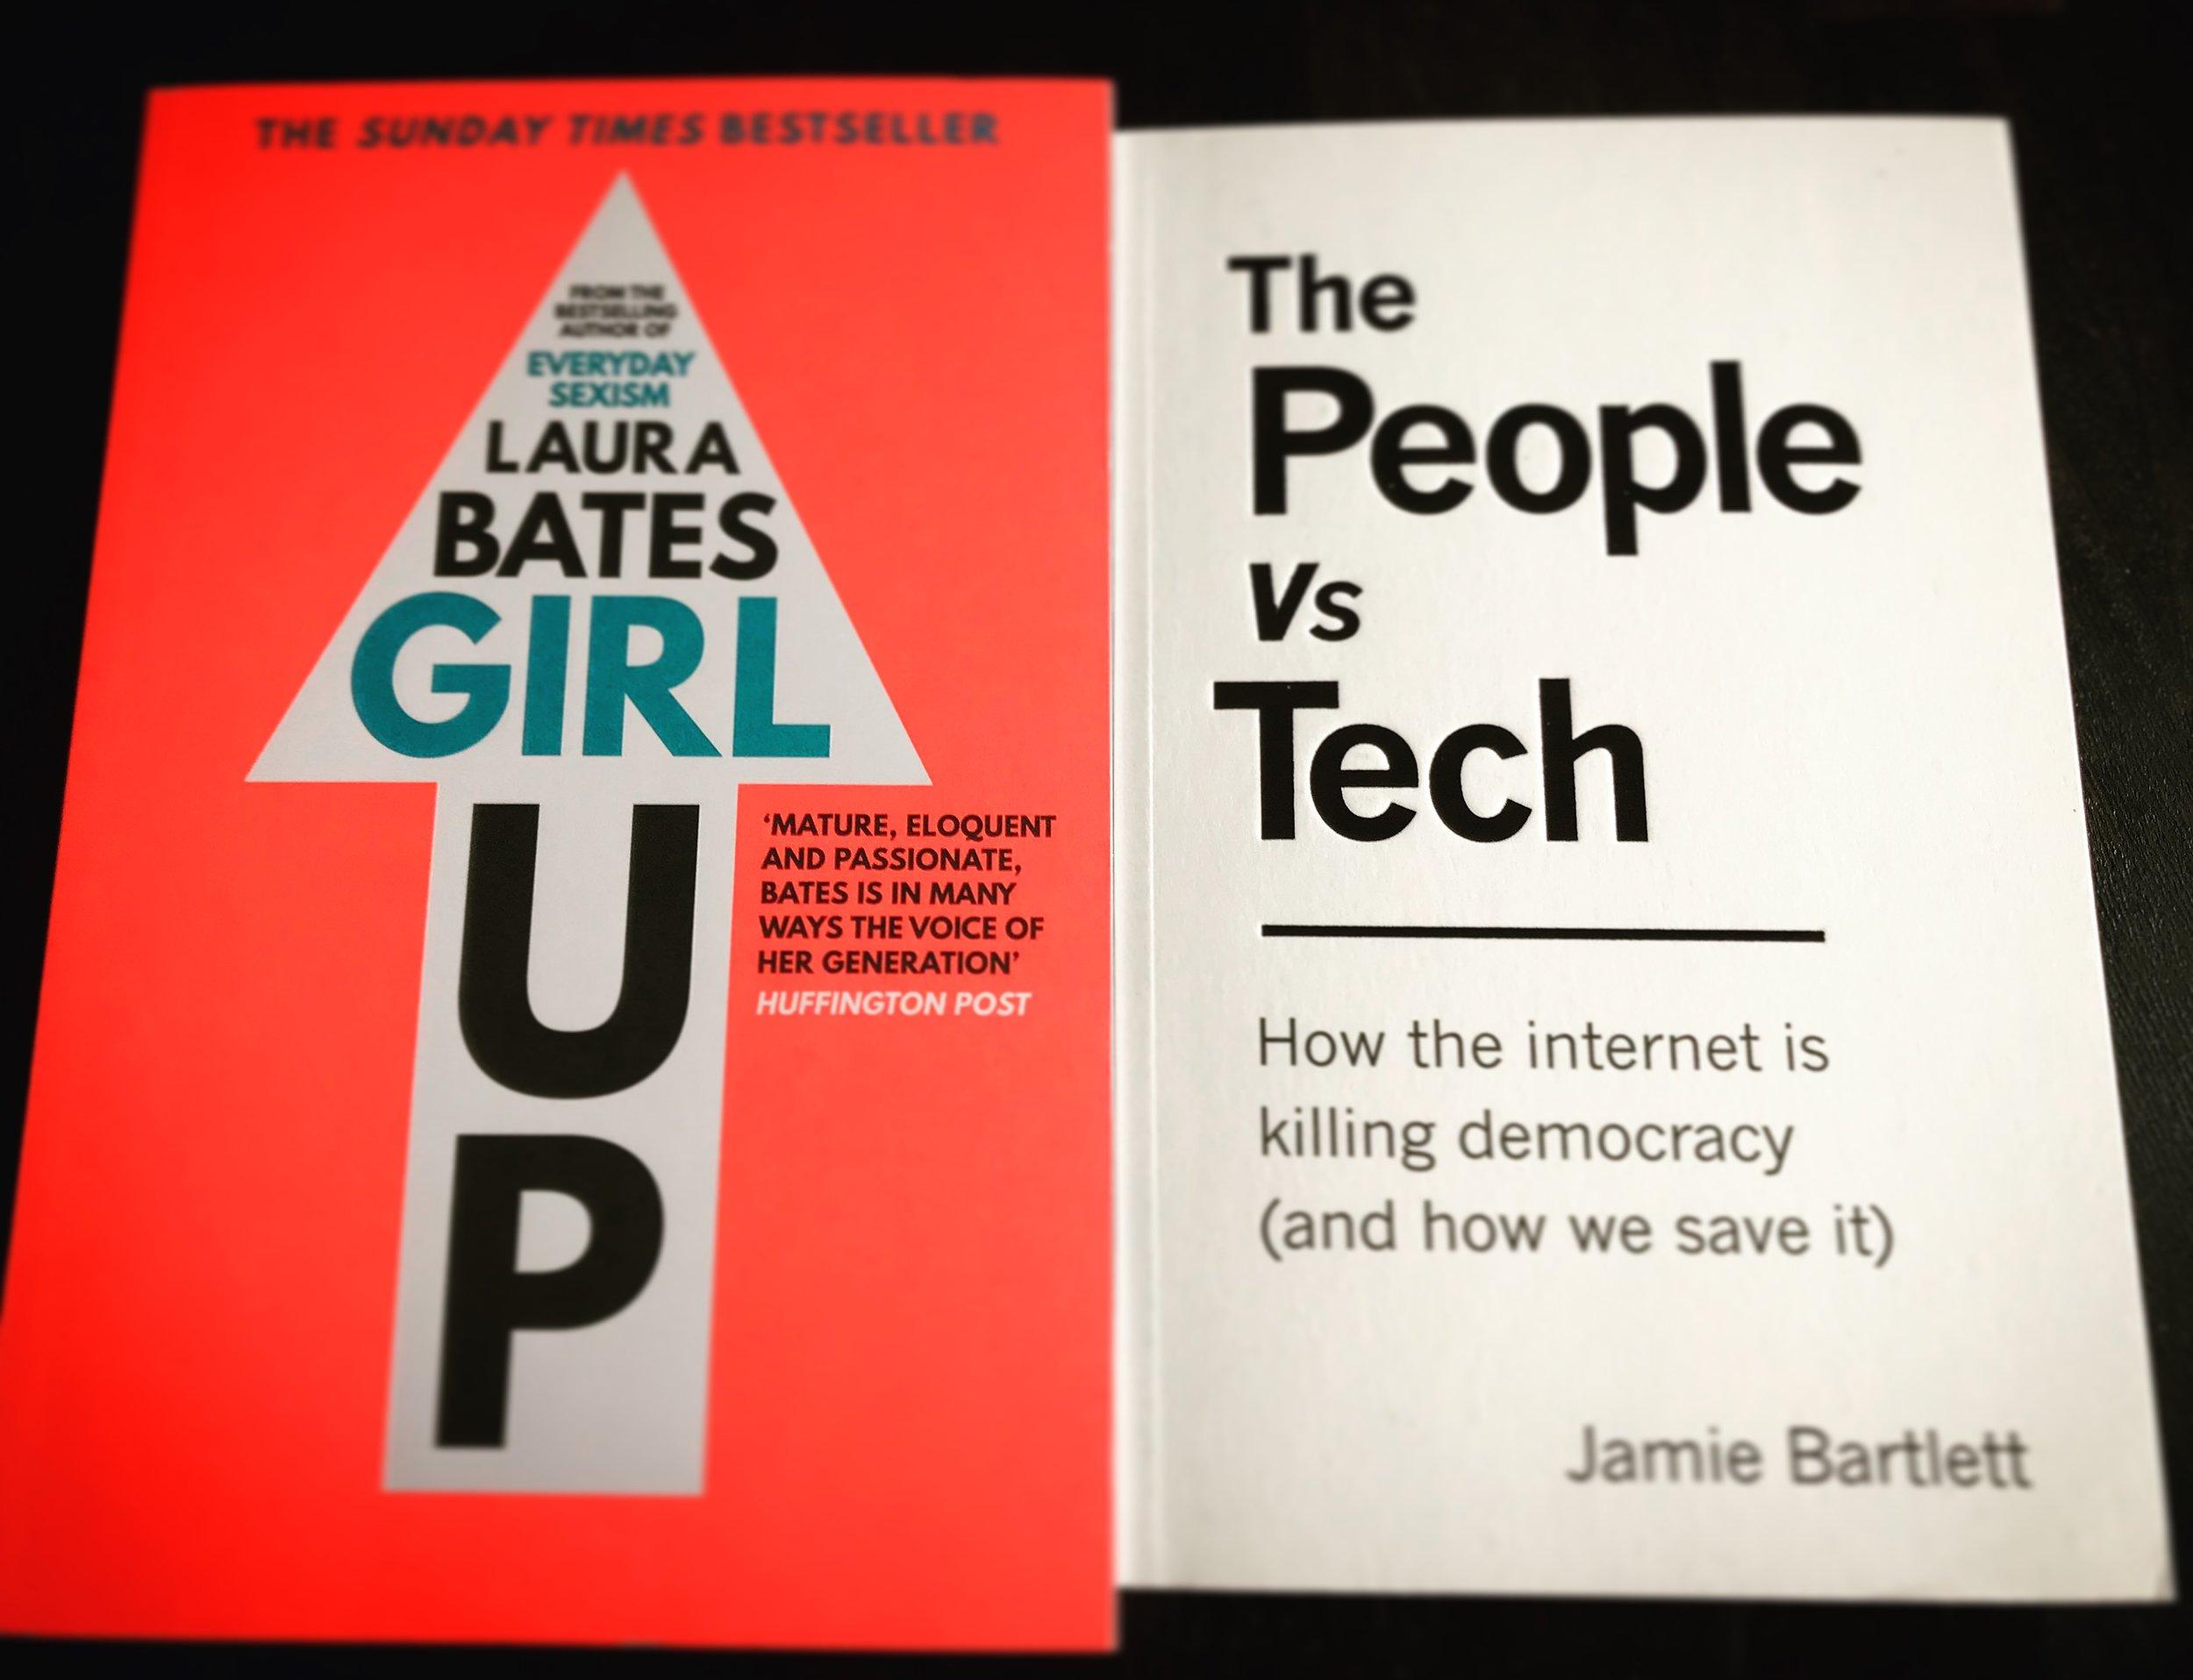 GIRL UP: LAURA BATES / THE PEOPLE VS TECH: JAMIE BARTLETT